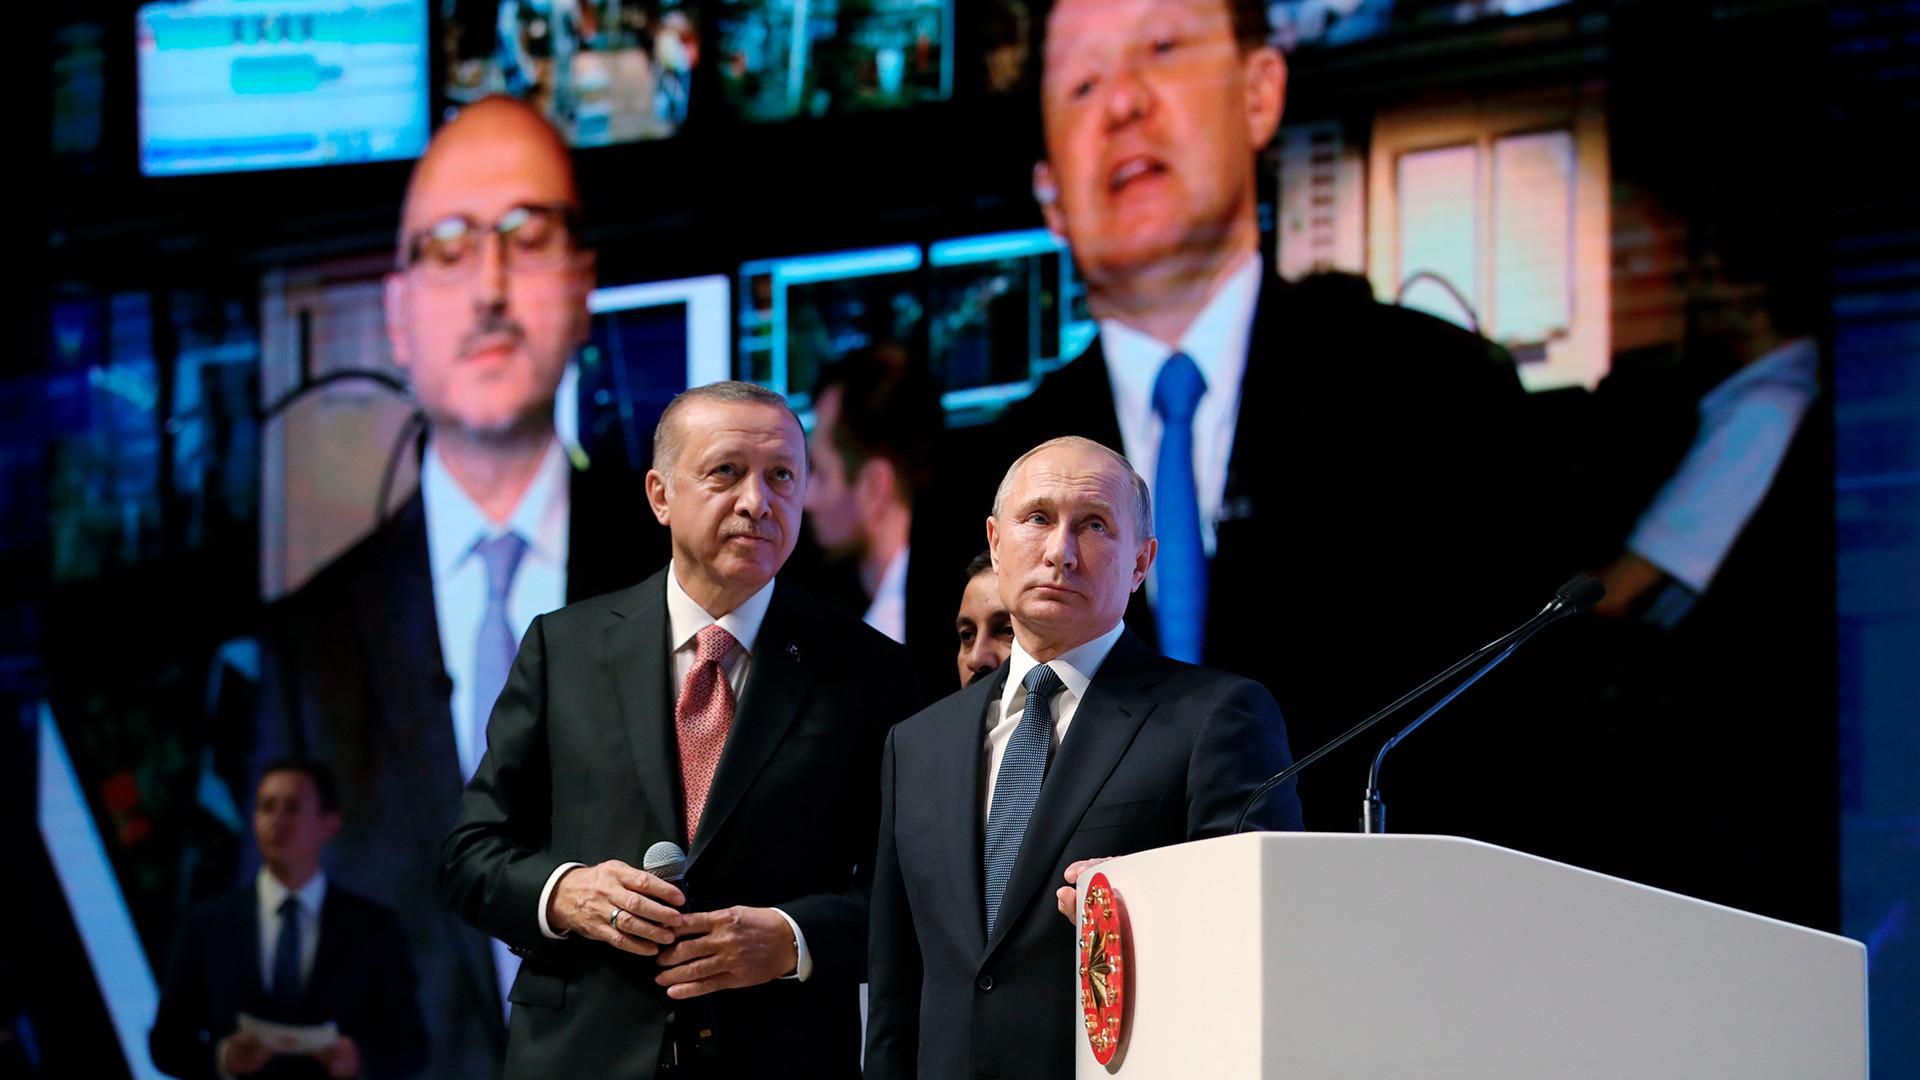 Vladimir Putin dan Recep Tayyip Erdogan pada upacara peresmian.